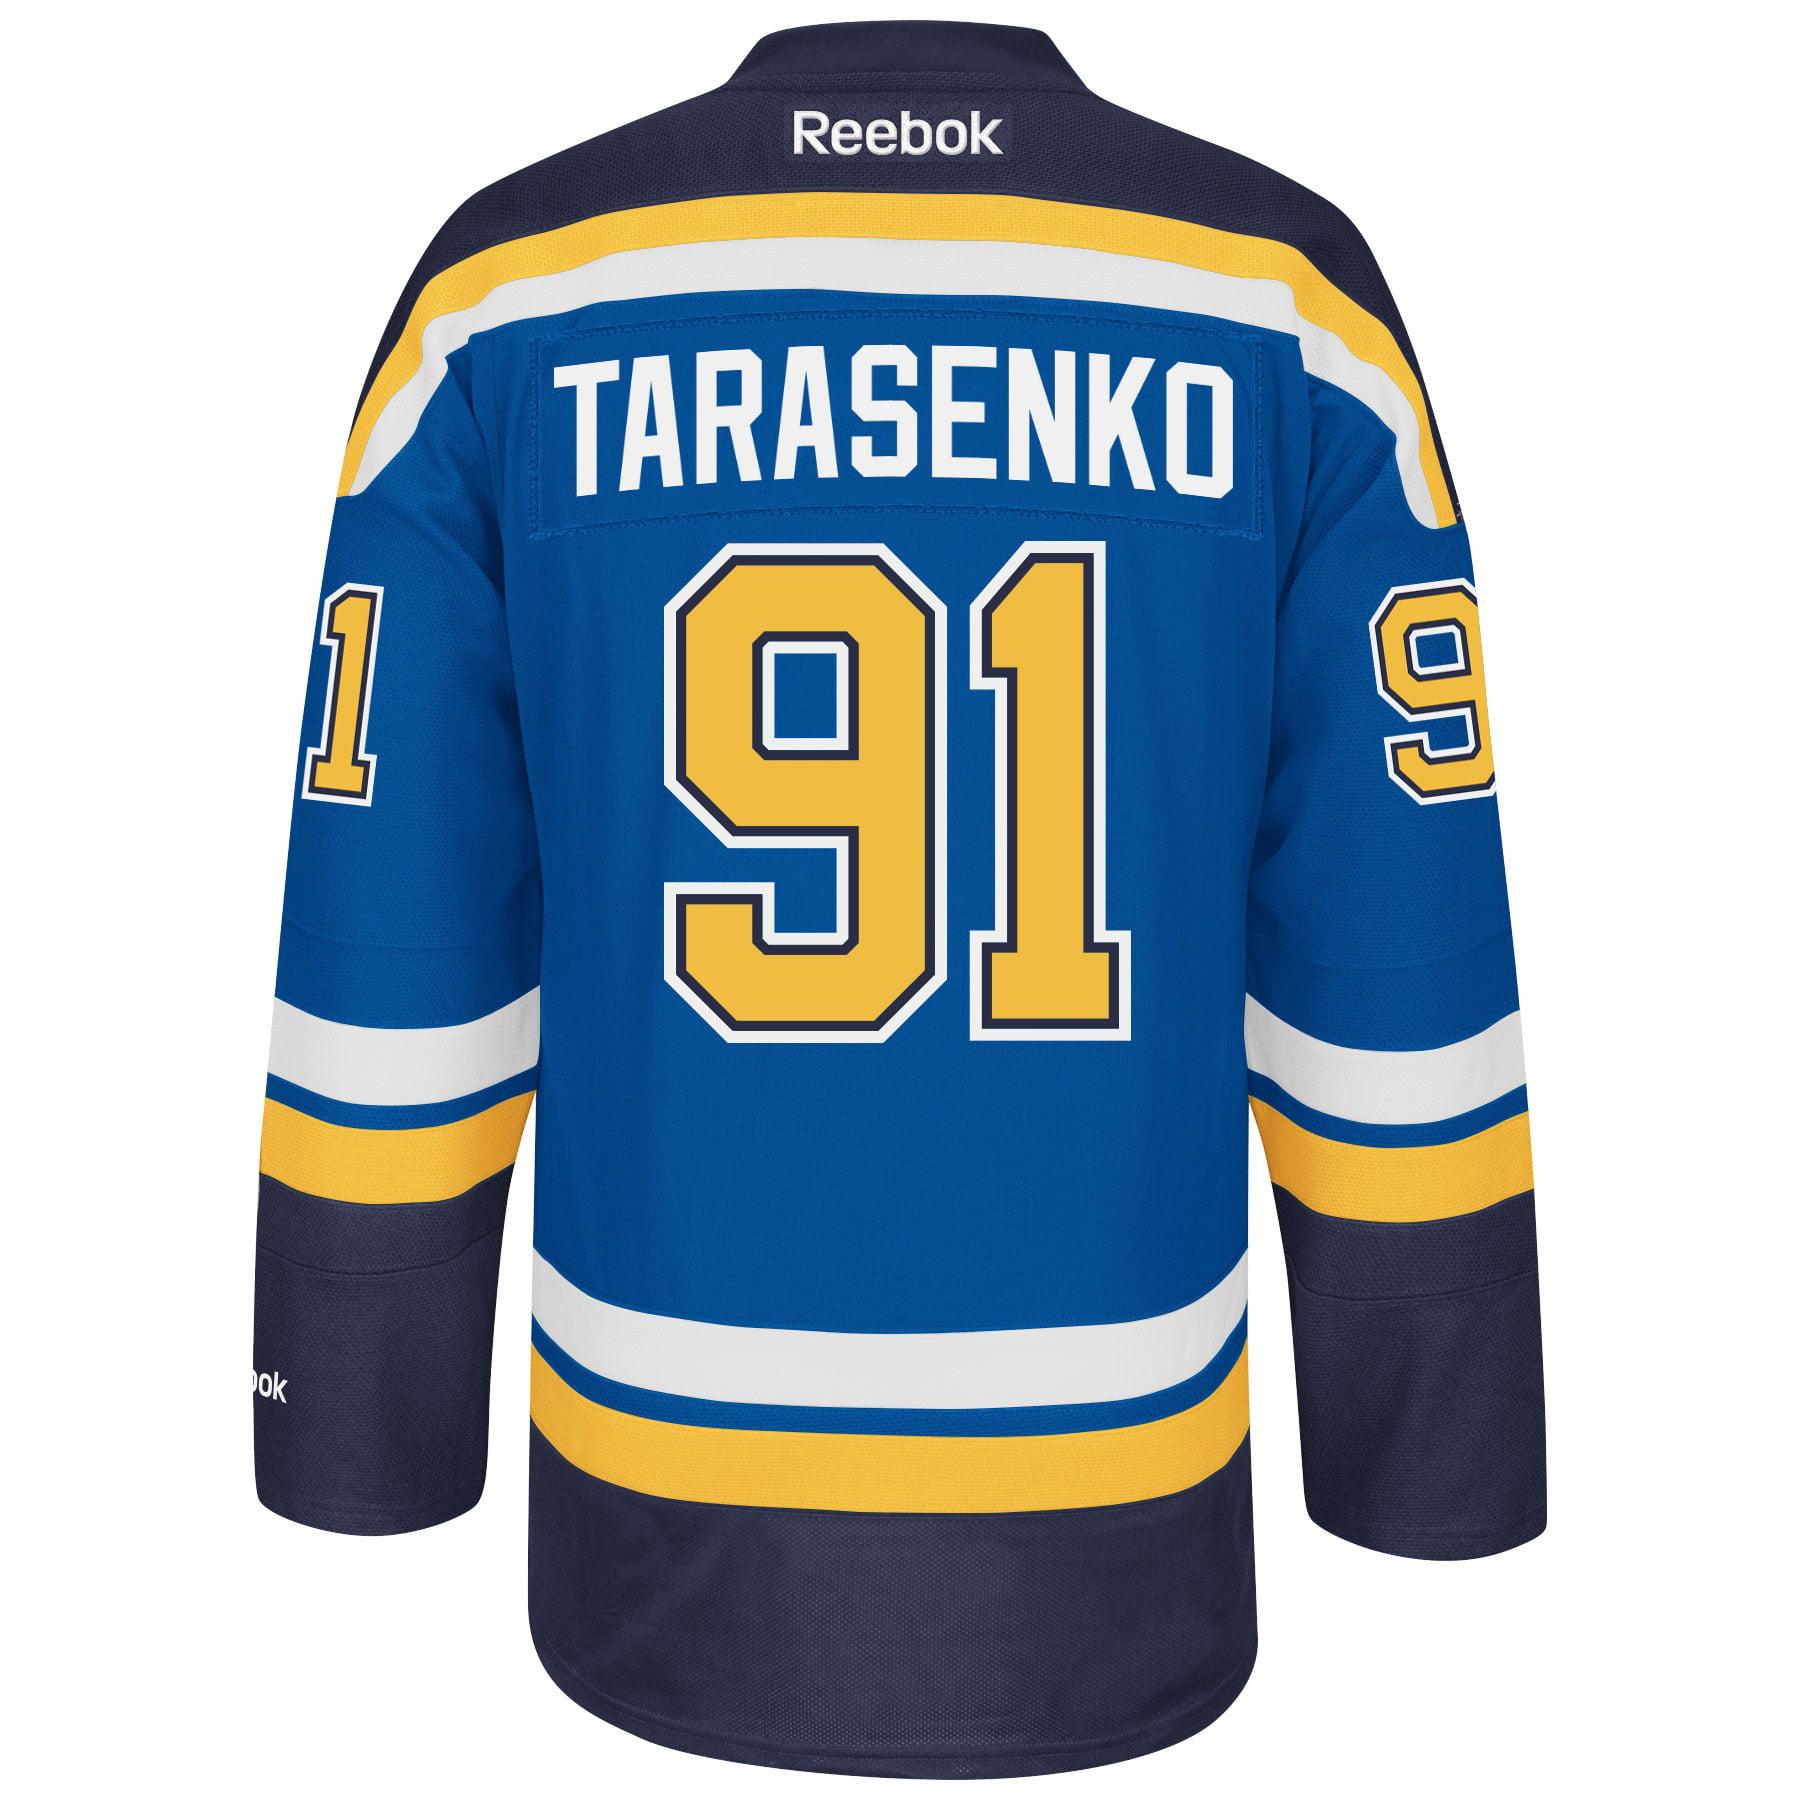 Tarasenko Tarasenko Tarasenko Sale For Jersey For Jersey Jersey For Sale